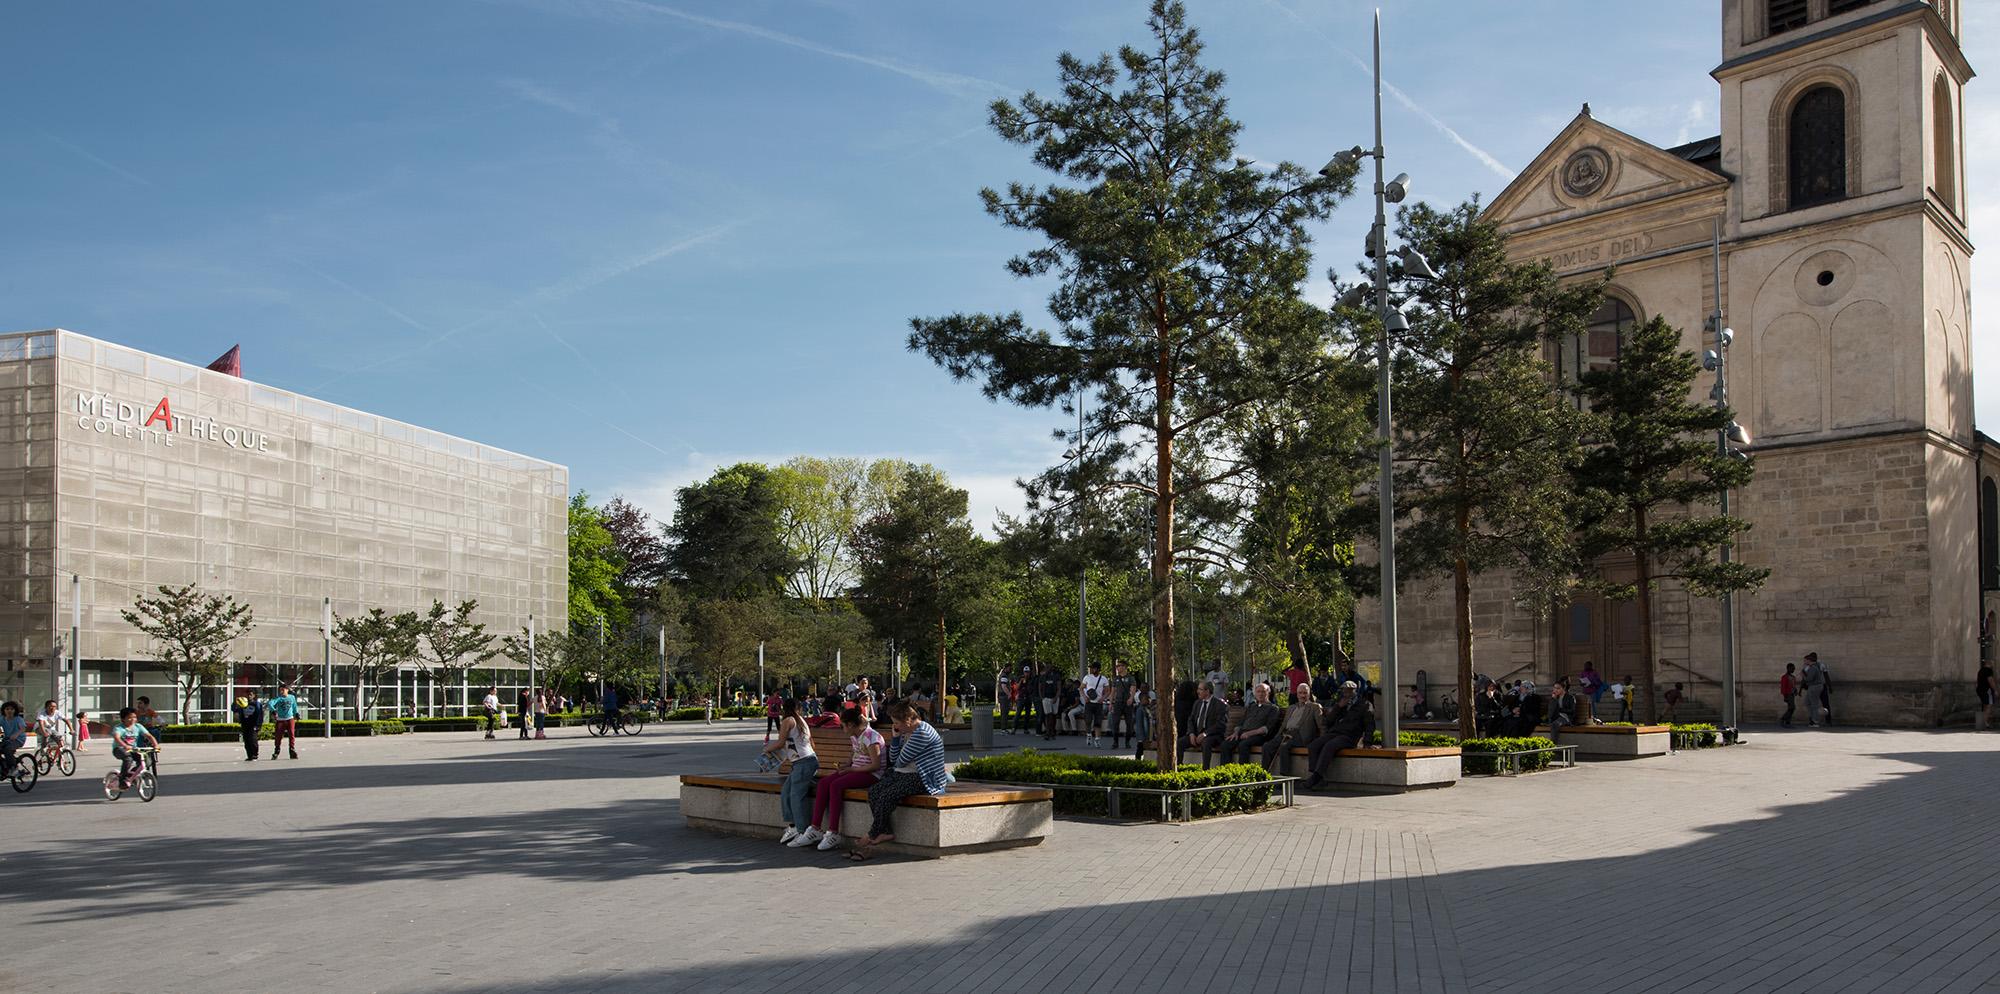 La place-jardin René Clair